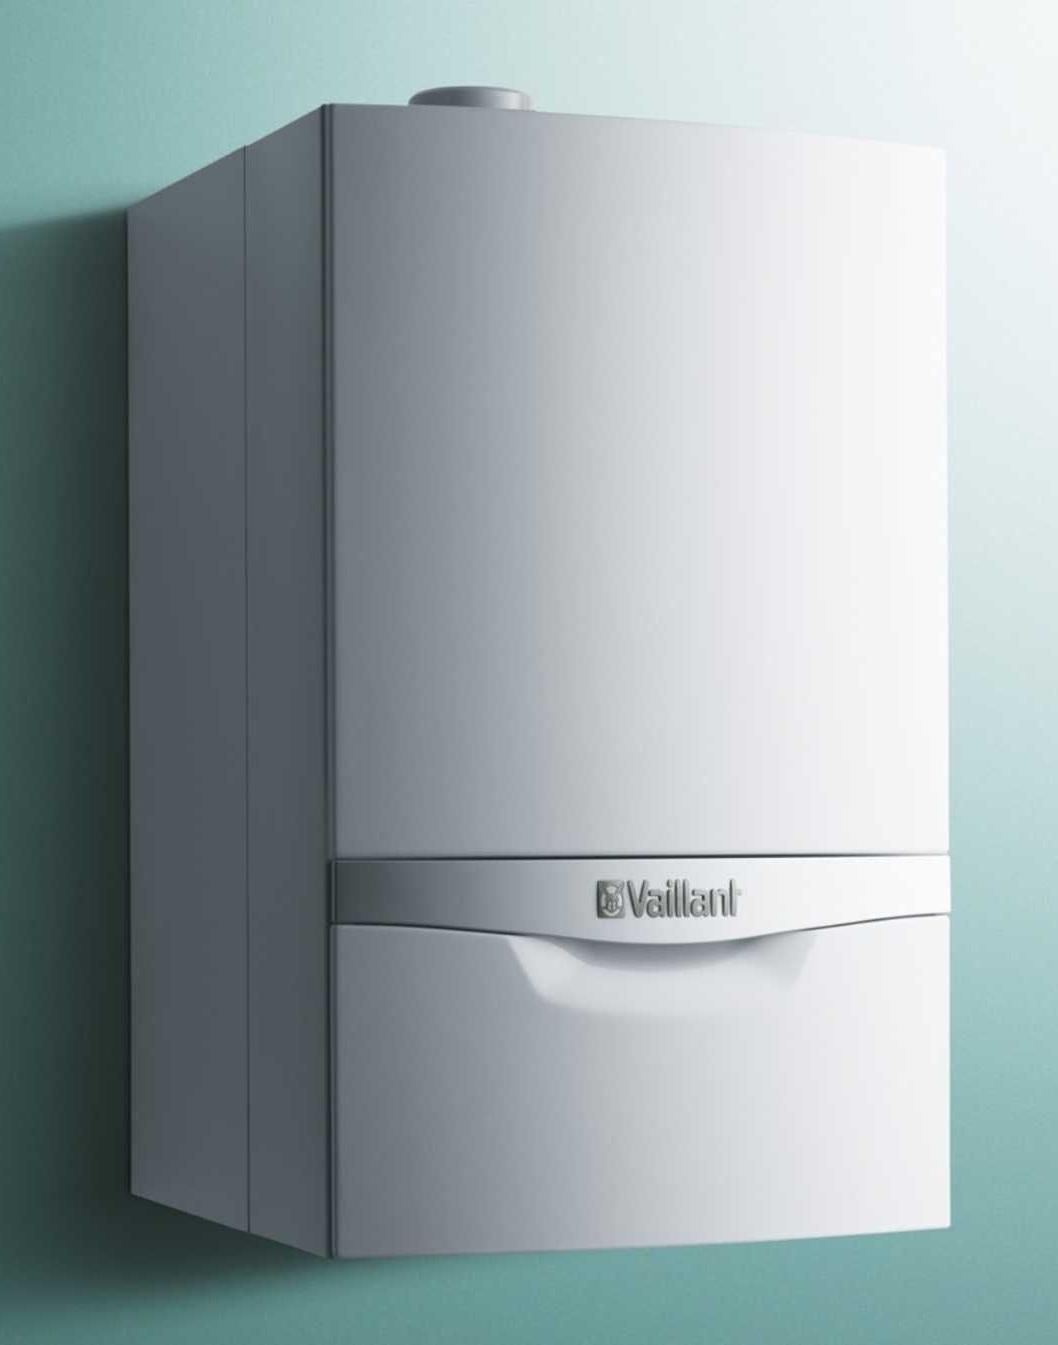 Газовый котел Vaillant ecoTEC VU 486/5-5